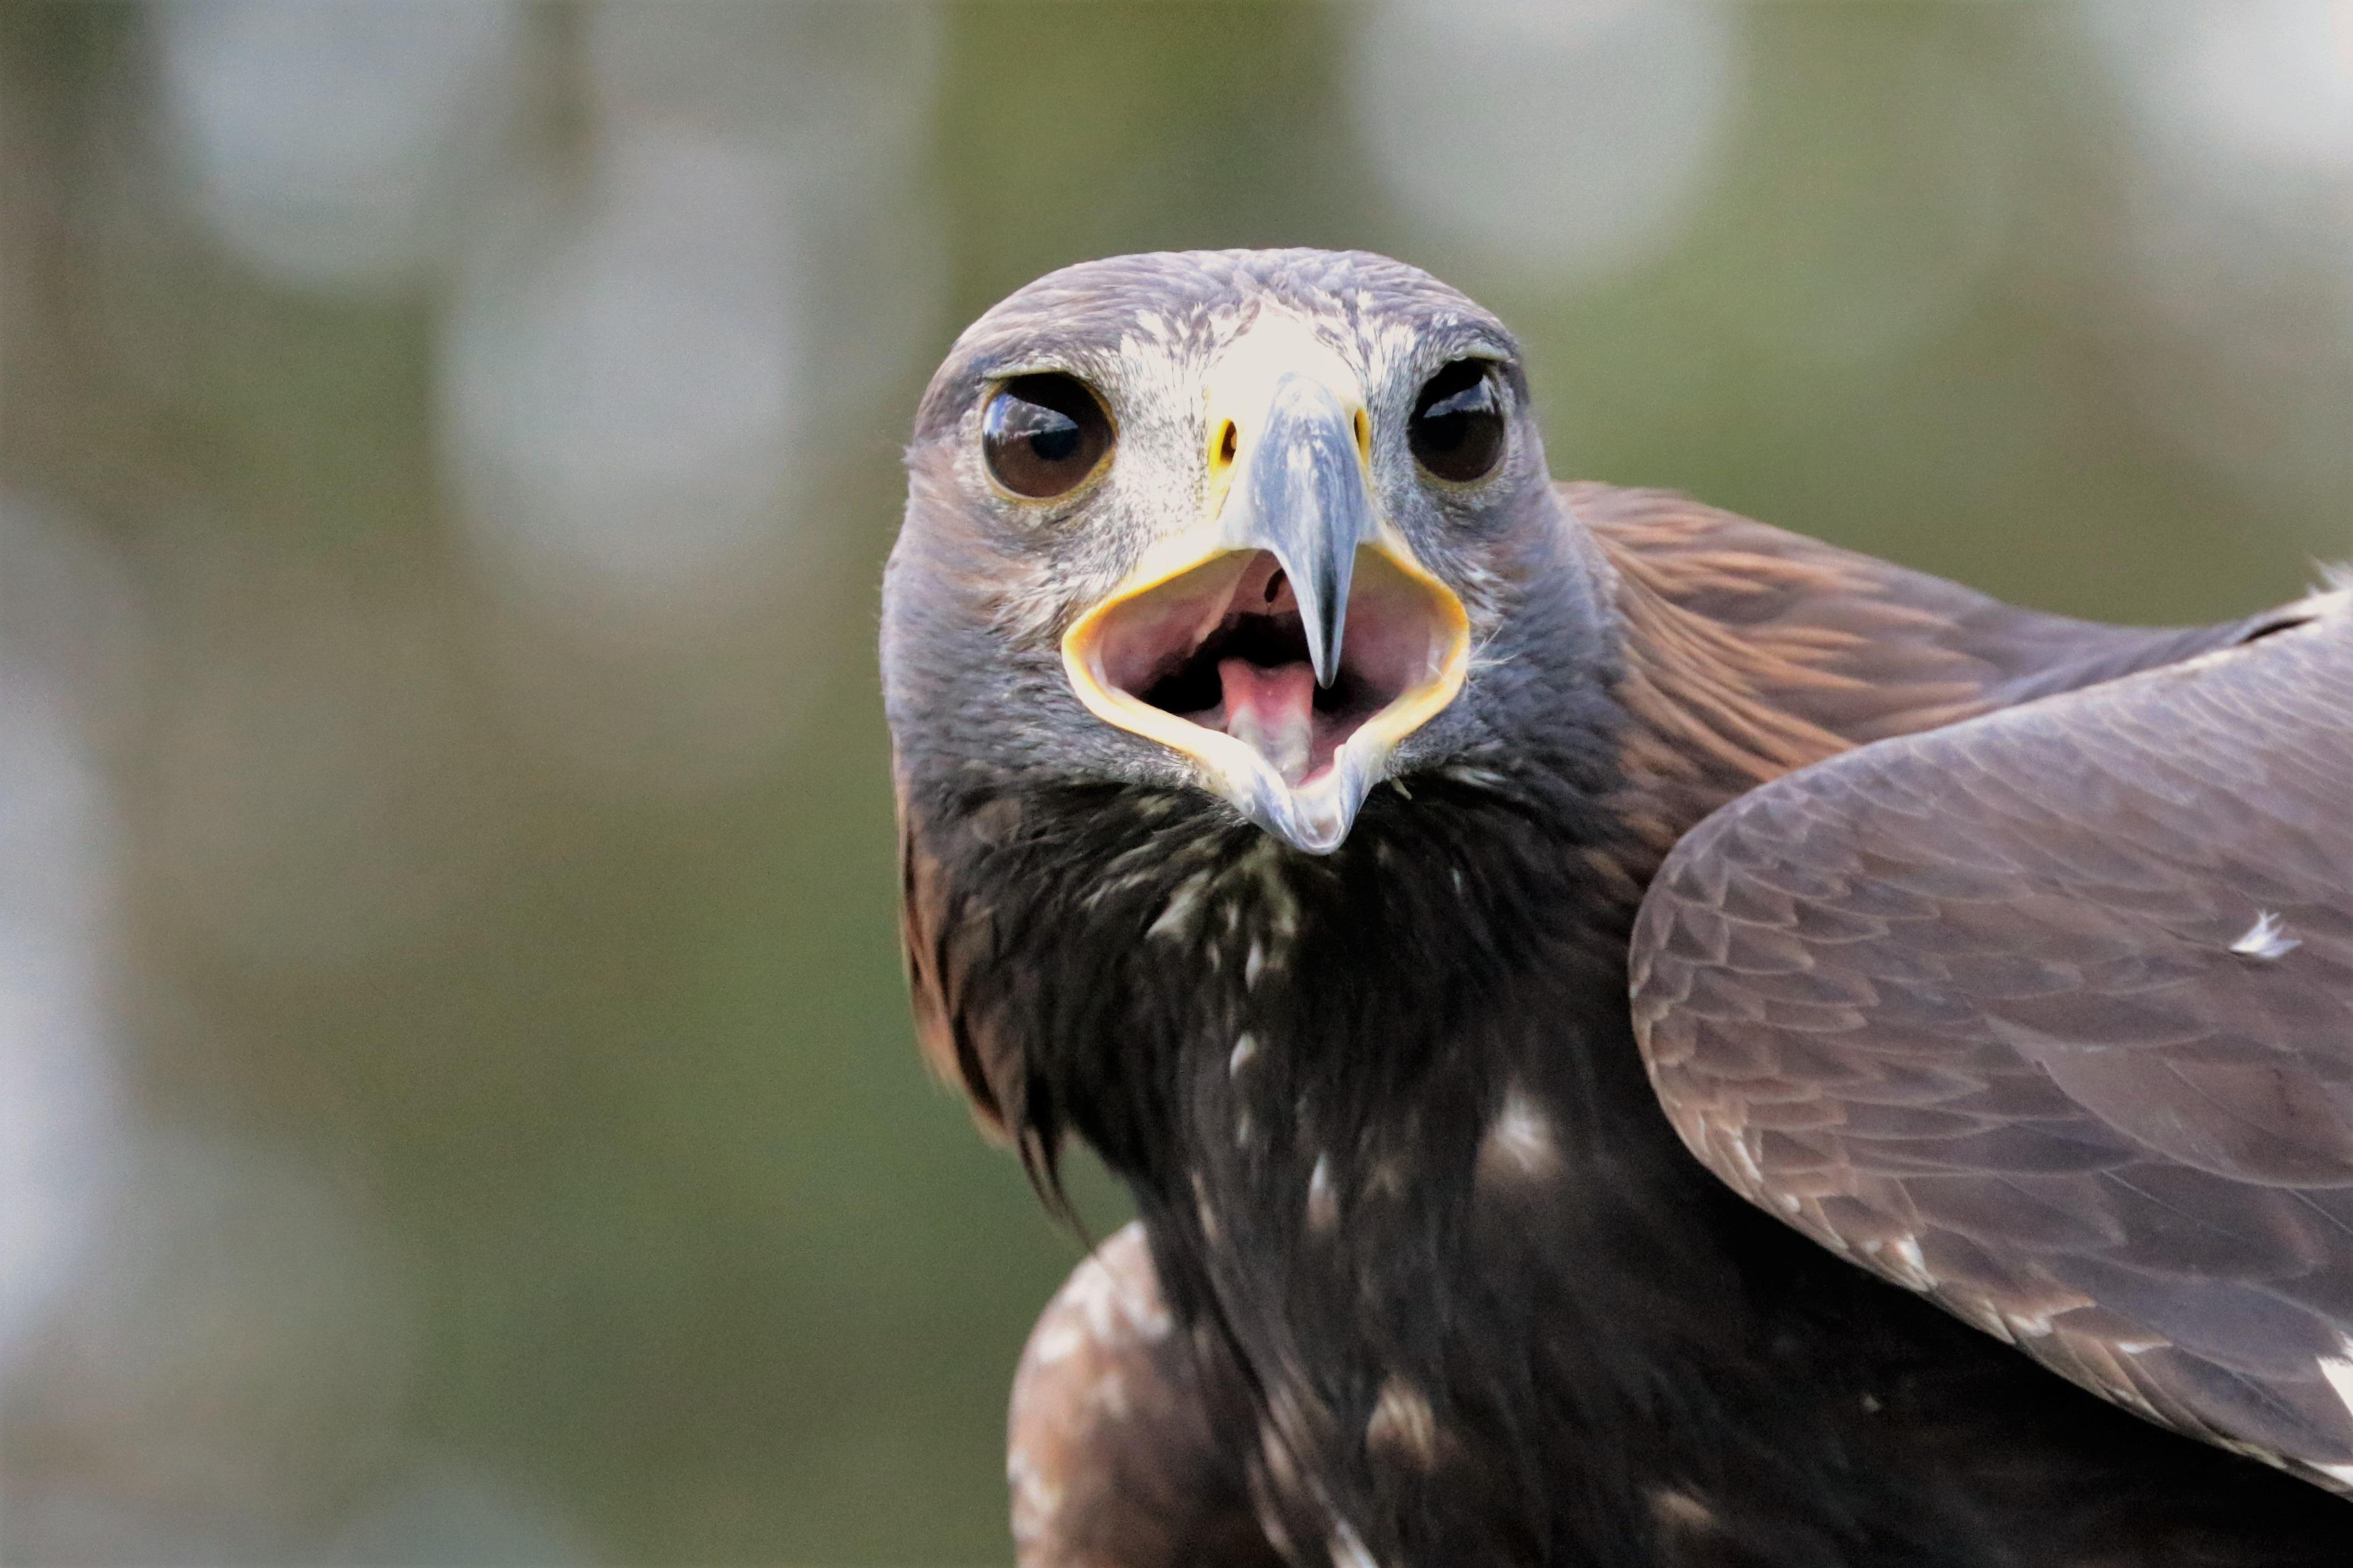 banco de imagens natureza pássaro asa animal perfil animais